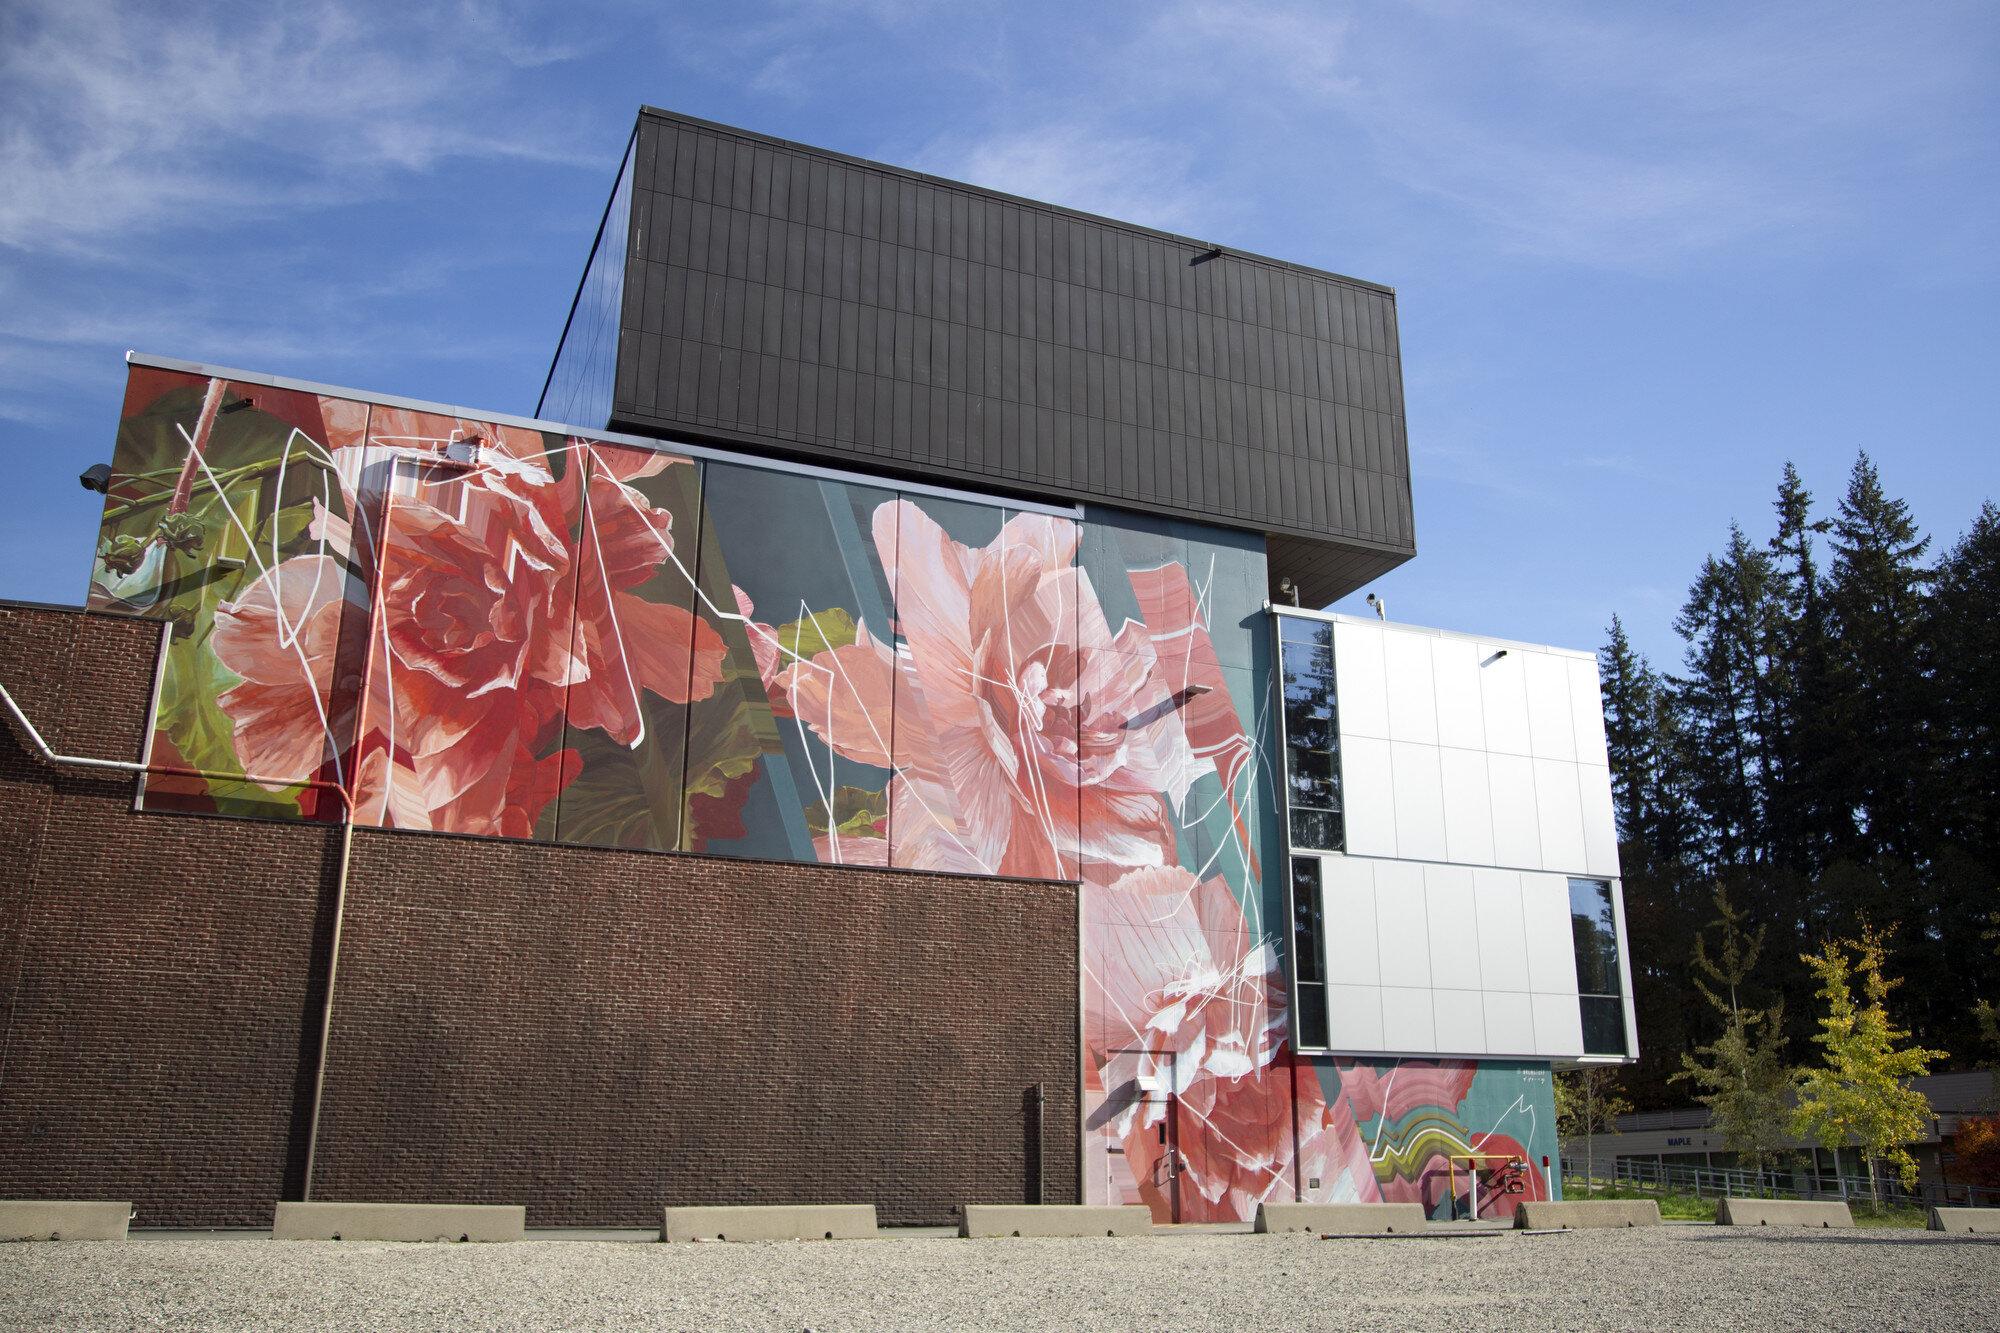 Drew-Young-mural (2).jpg